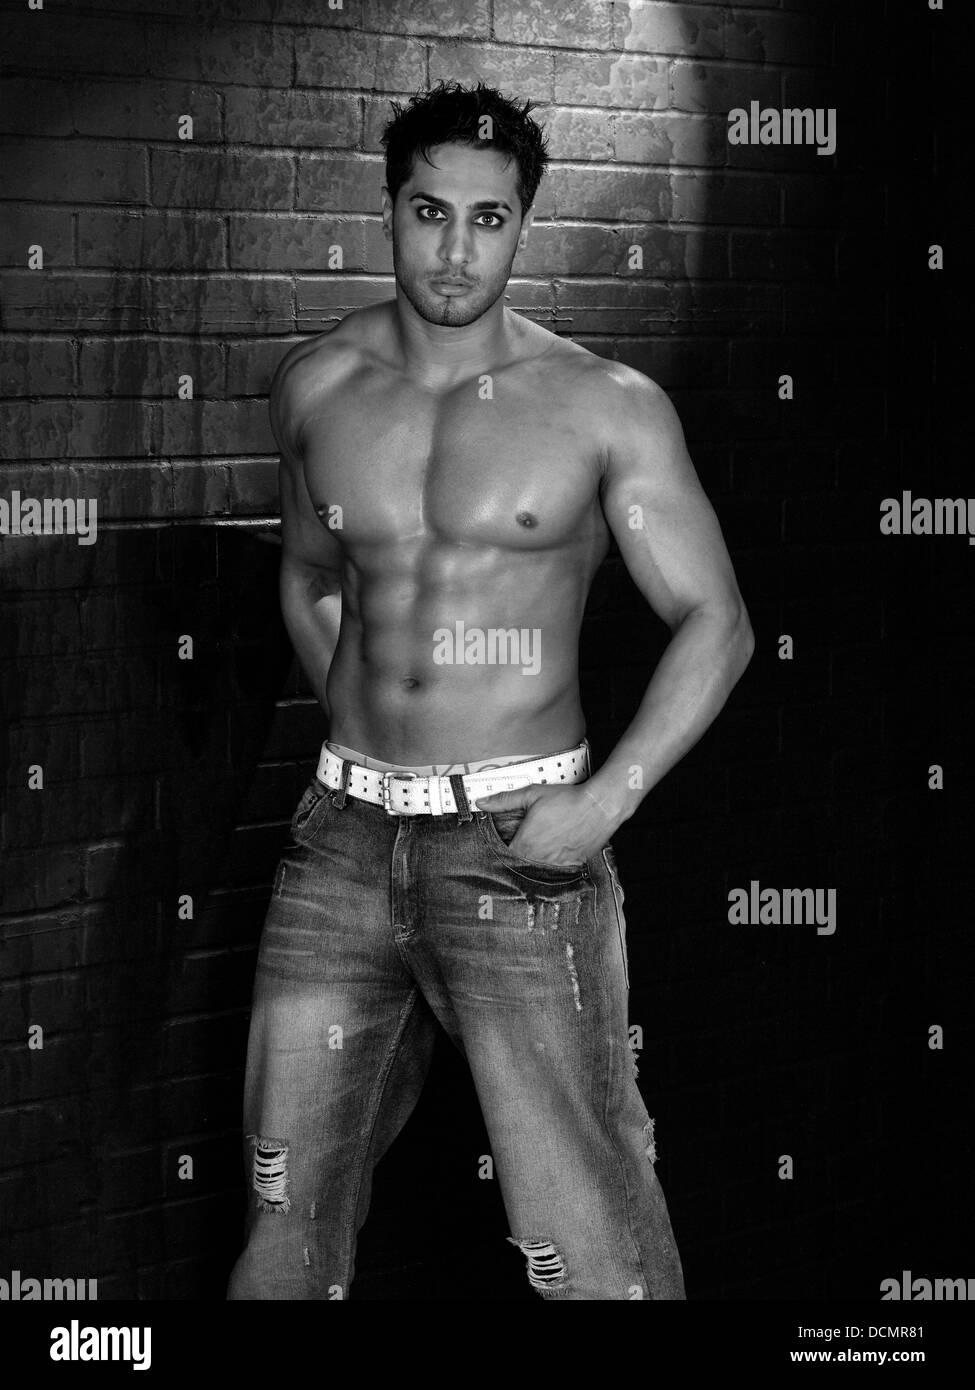 Asian Muscle Man 45